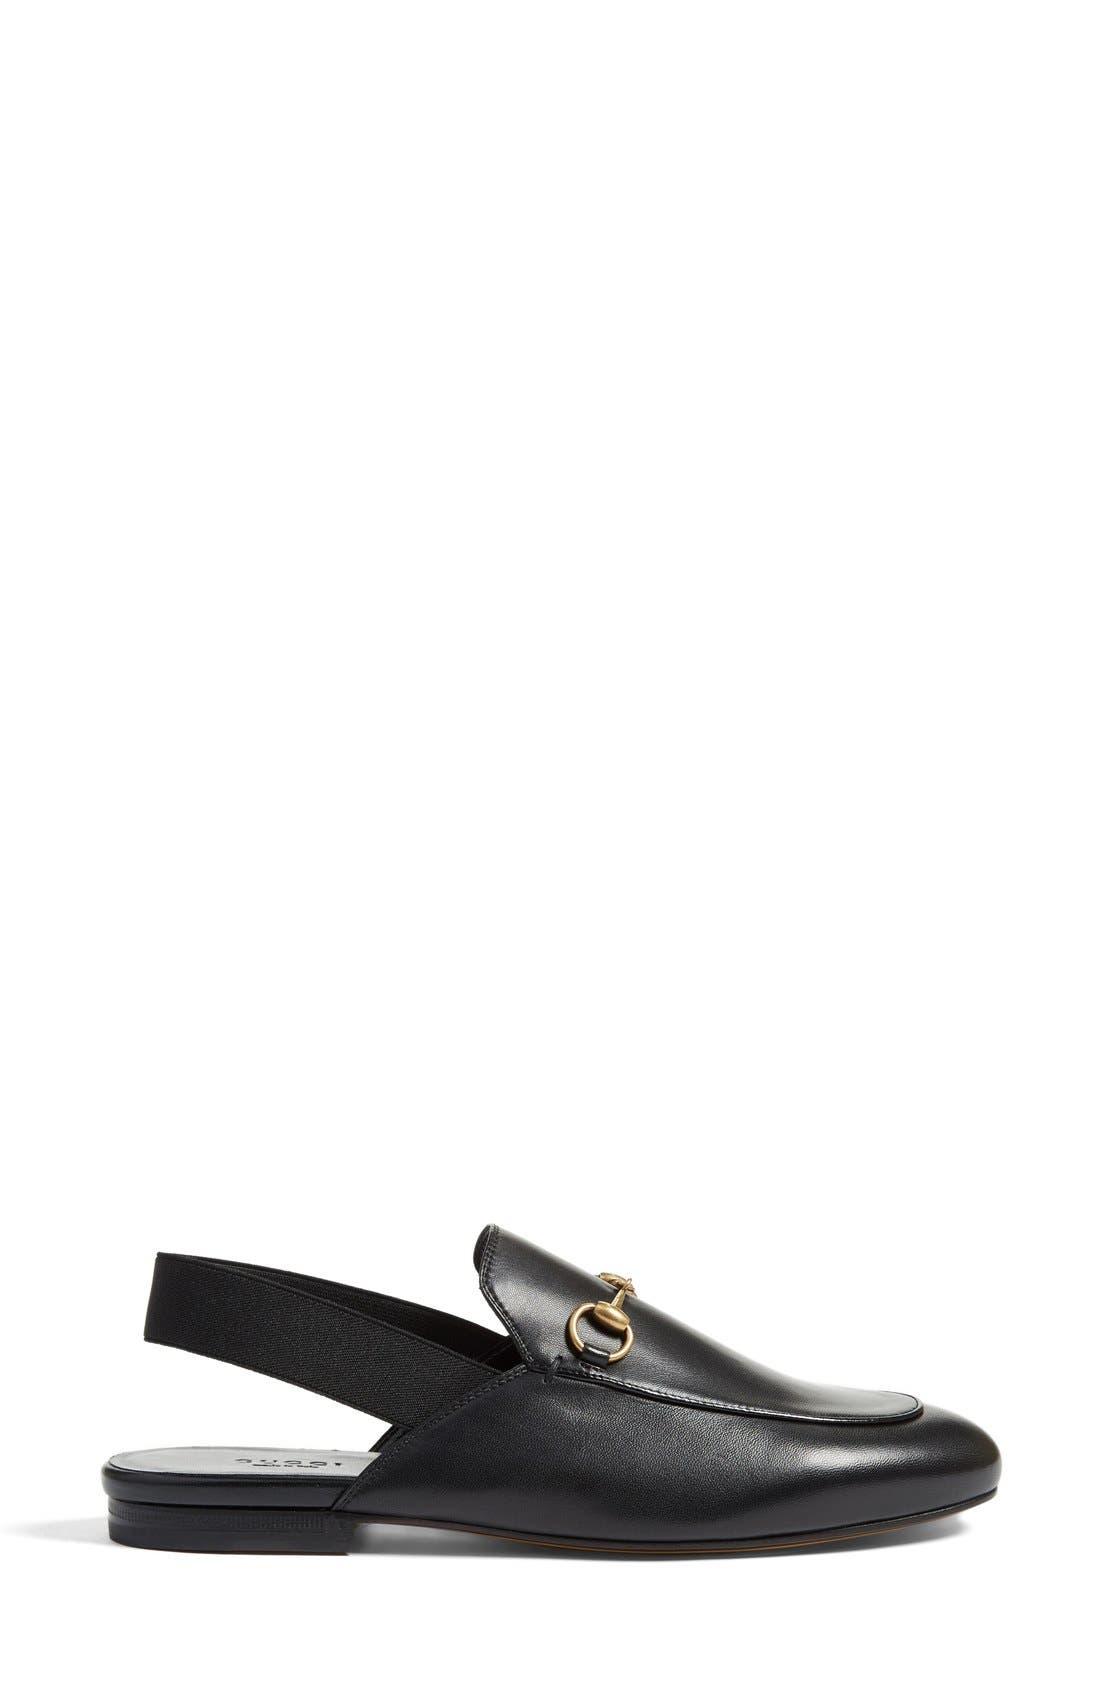 Kings Slingback Mule,                             Alternate thumbnail 4, color,                             Black Leather